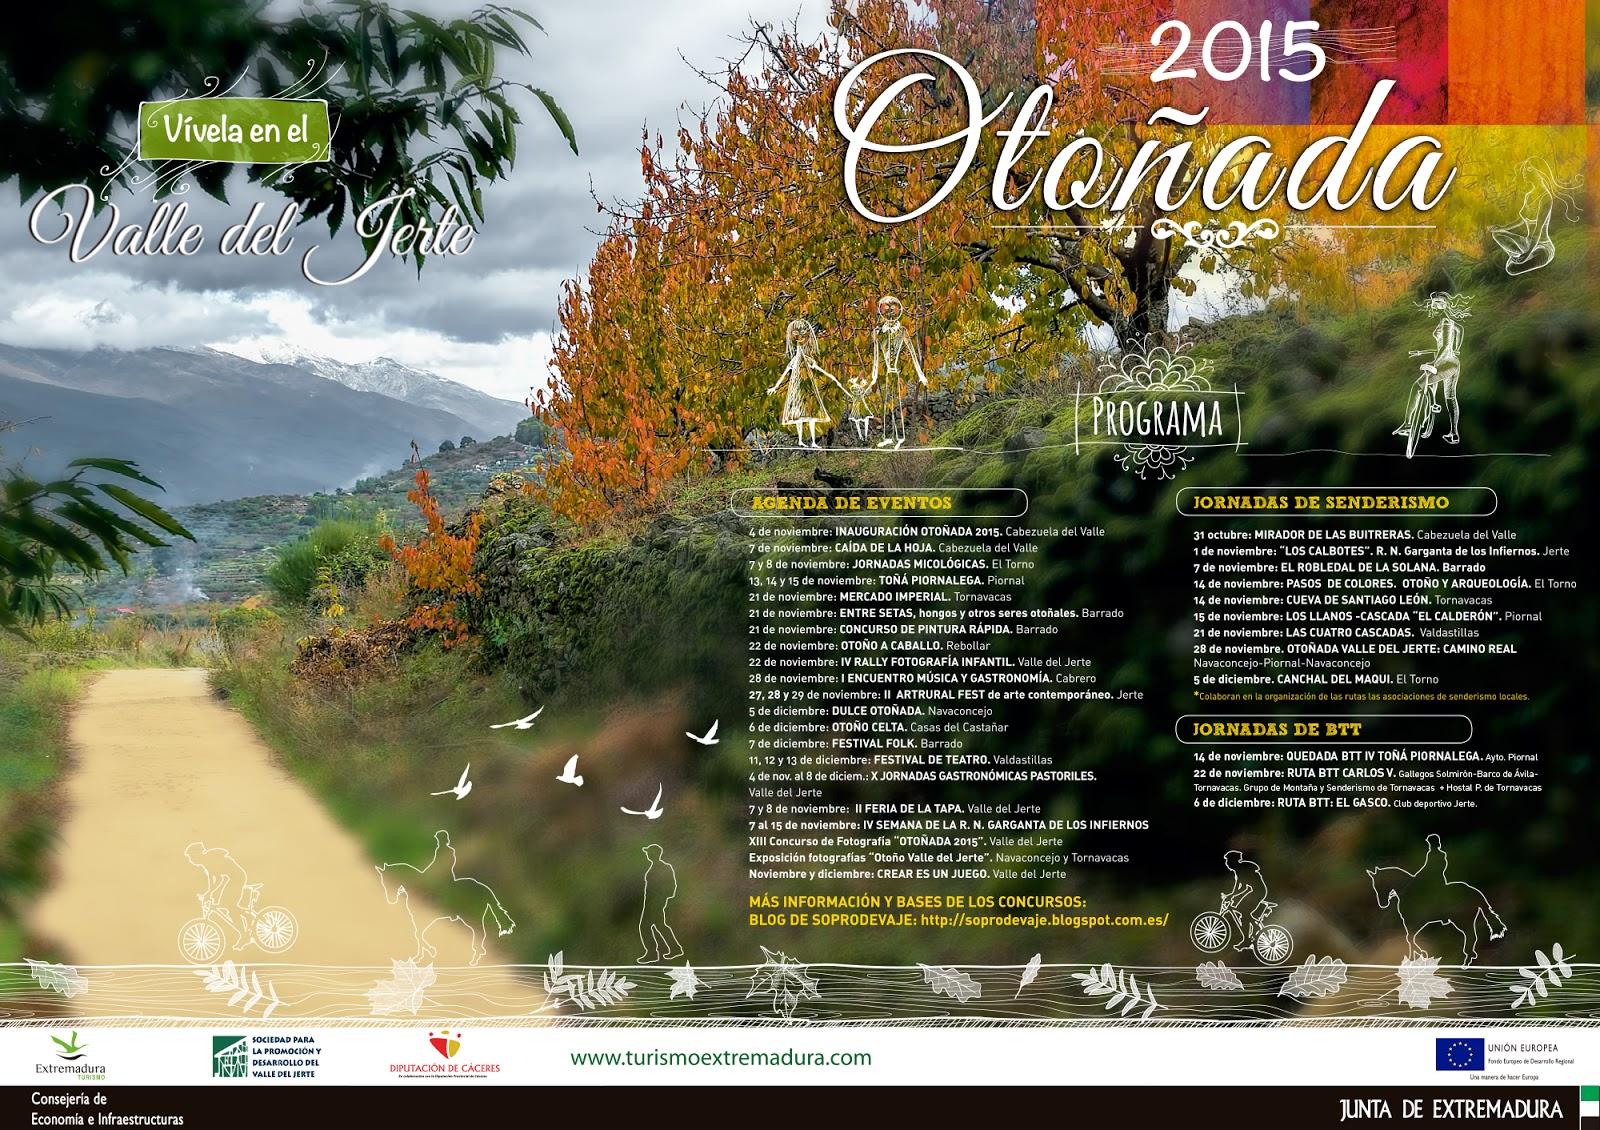 Programa Otonada 2015 Valle del Jerte